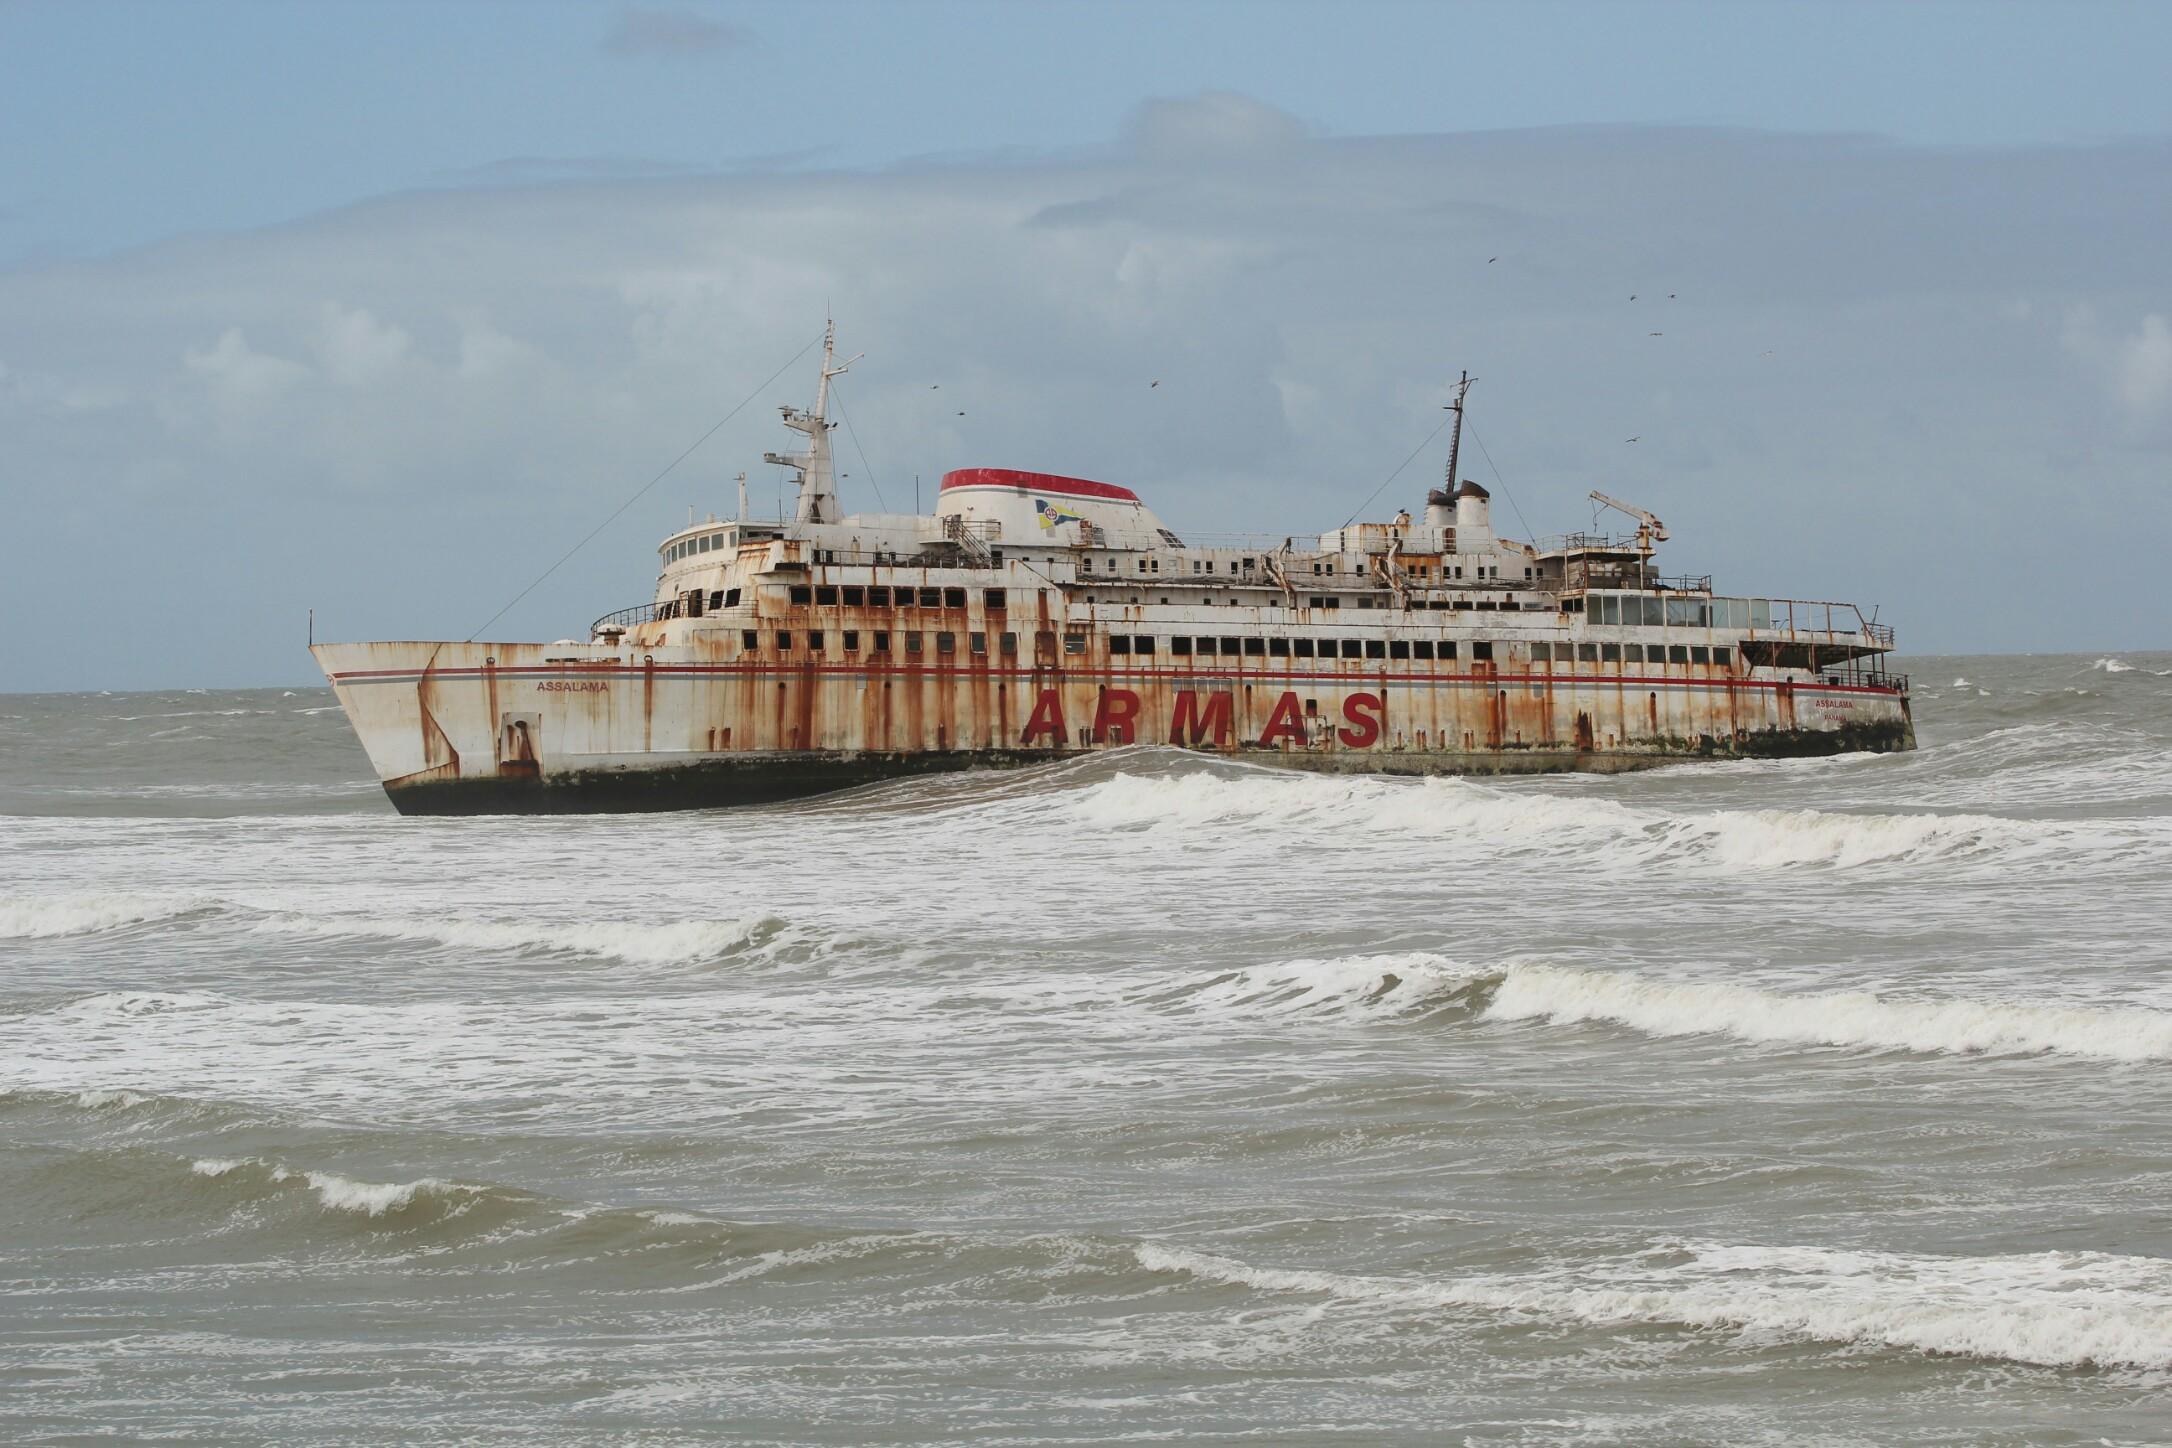 Maroko.Tarfaya.Wrak statku Assalama.